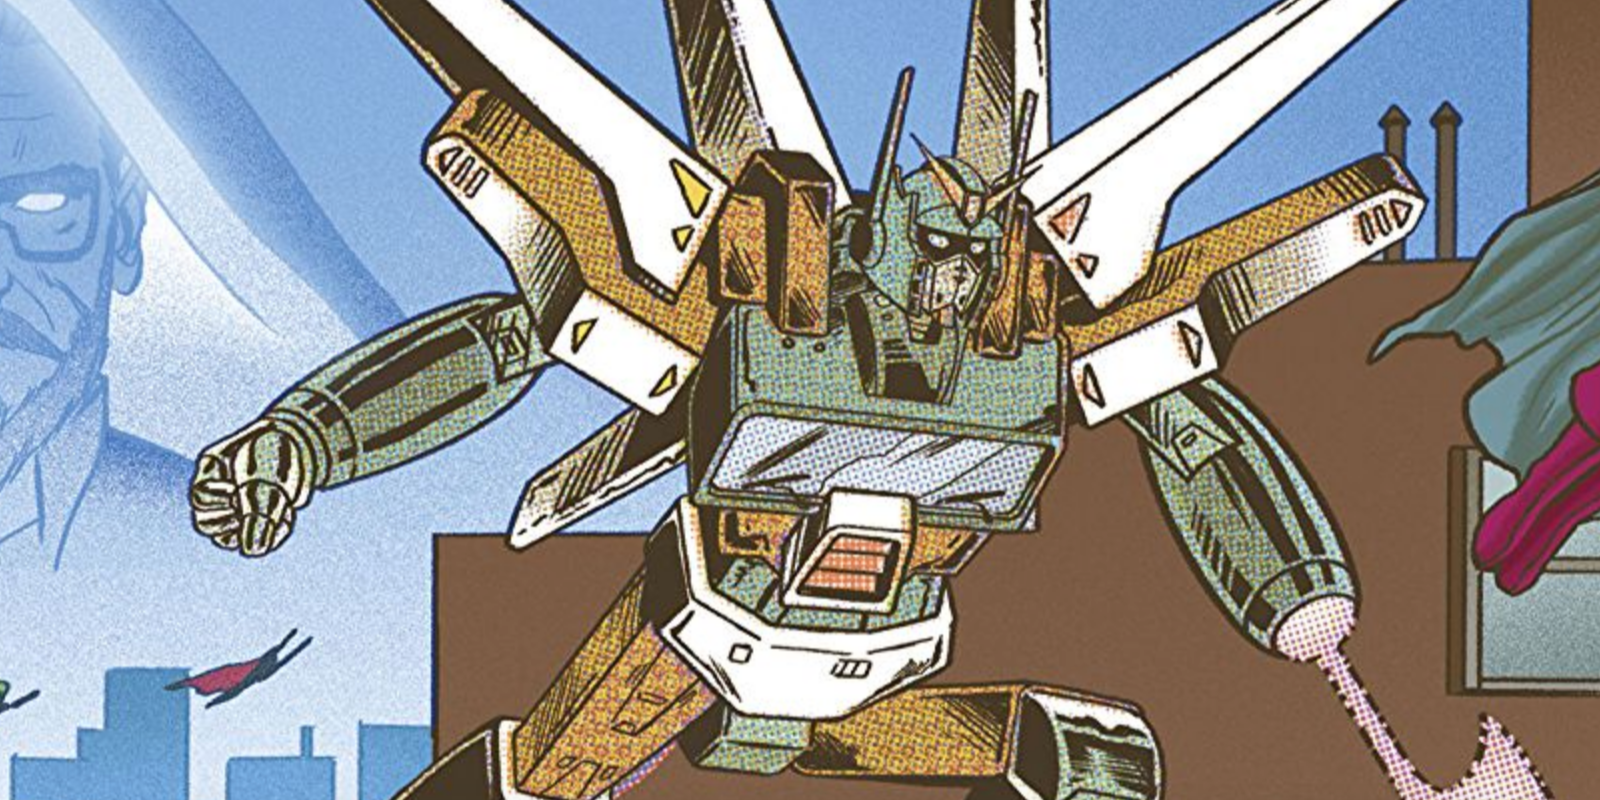 Transformers & Ninja Turtles Just Sneaked Into the DC Universe (Kinda)